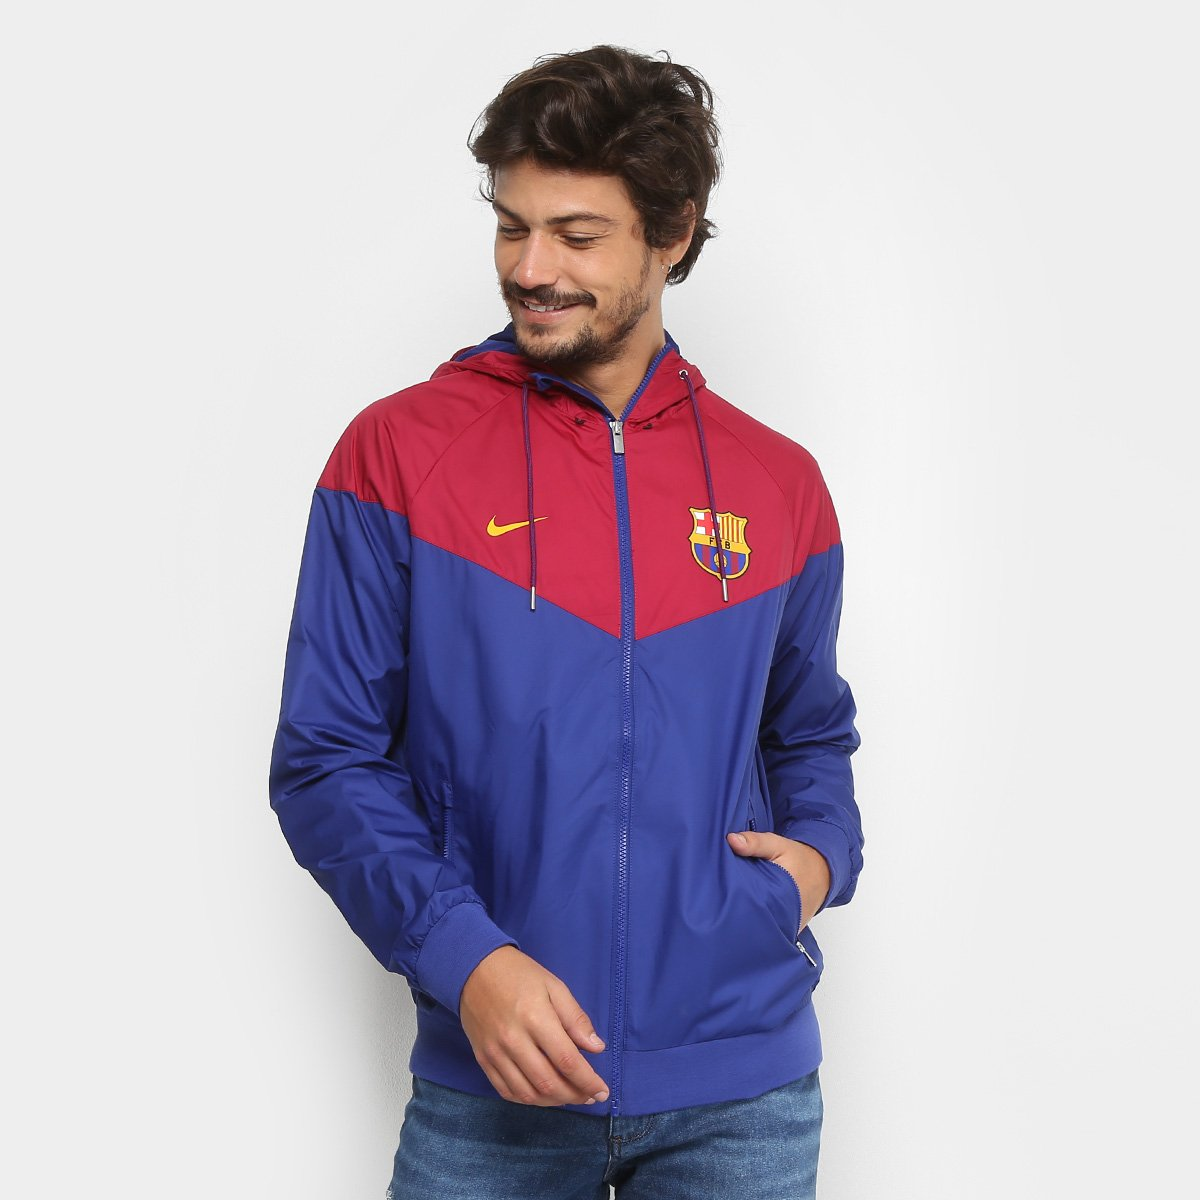 8b70386ad5 Jaqueta Barcelona Nike Windrunner c/ Capuz Masculina